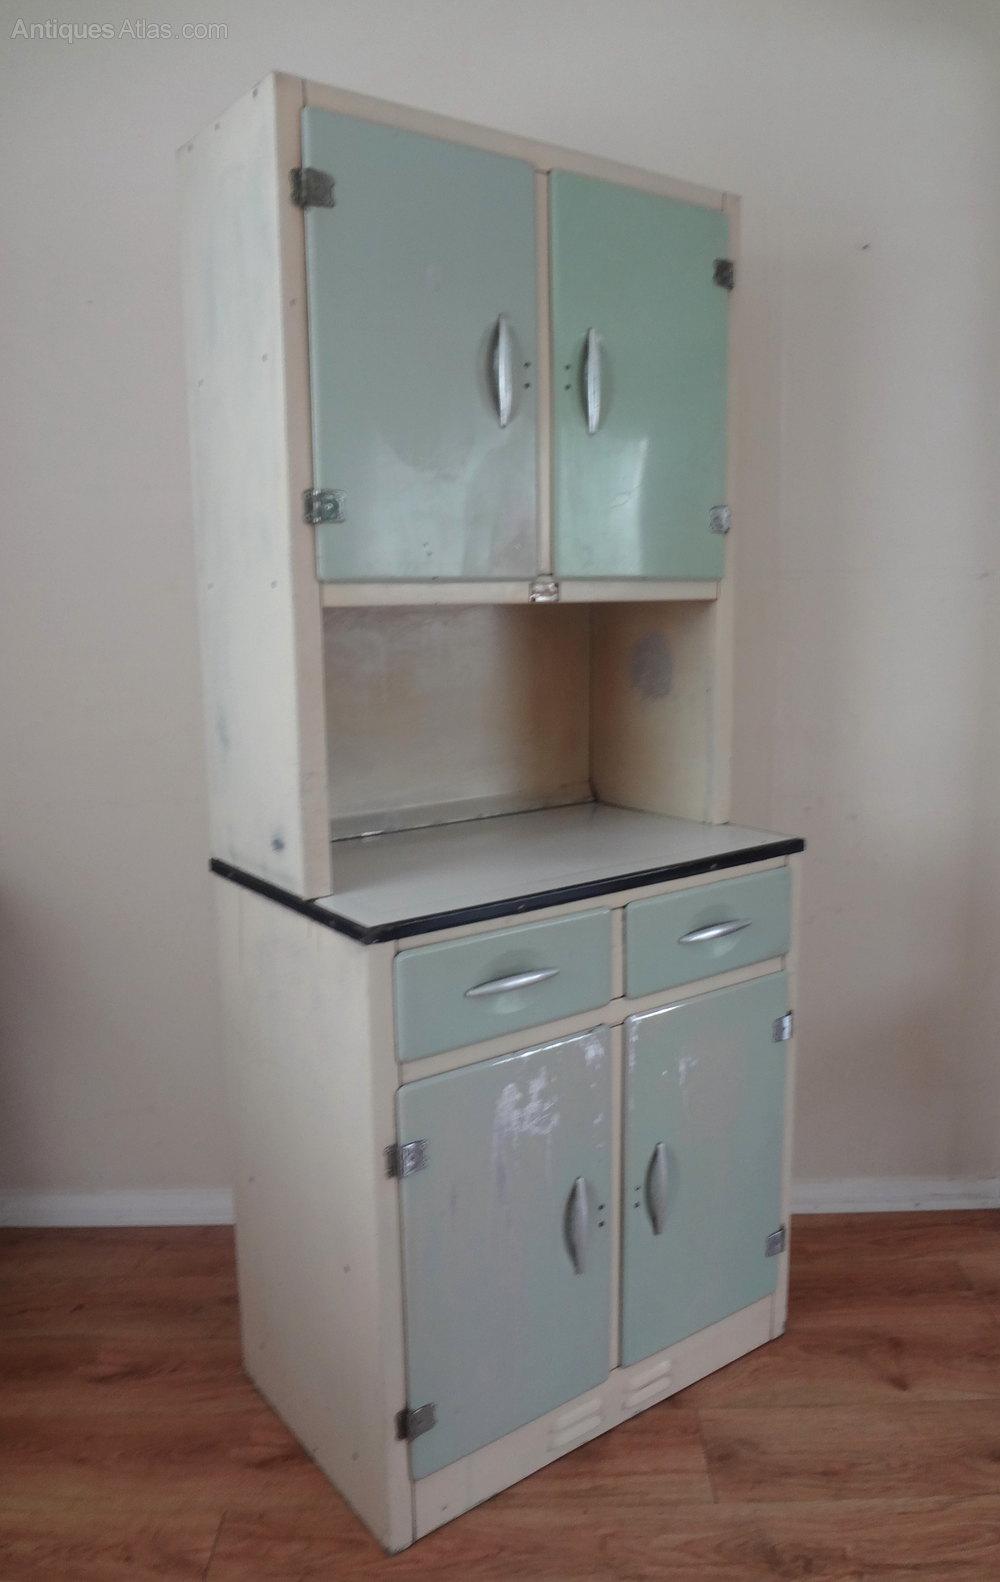 Antiques atlas retro kitchen larder cupboard for Kitchen in a cupboard